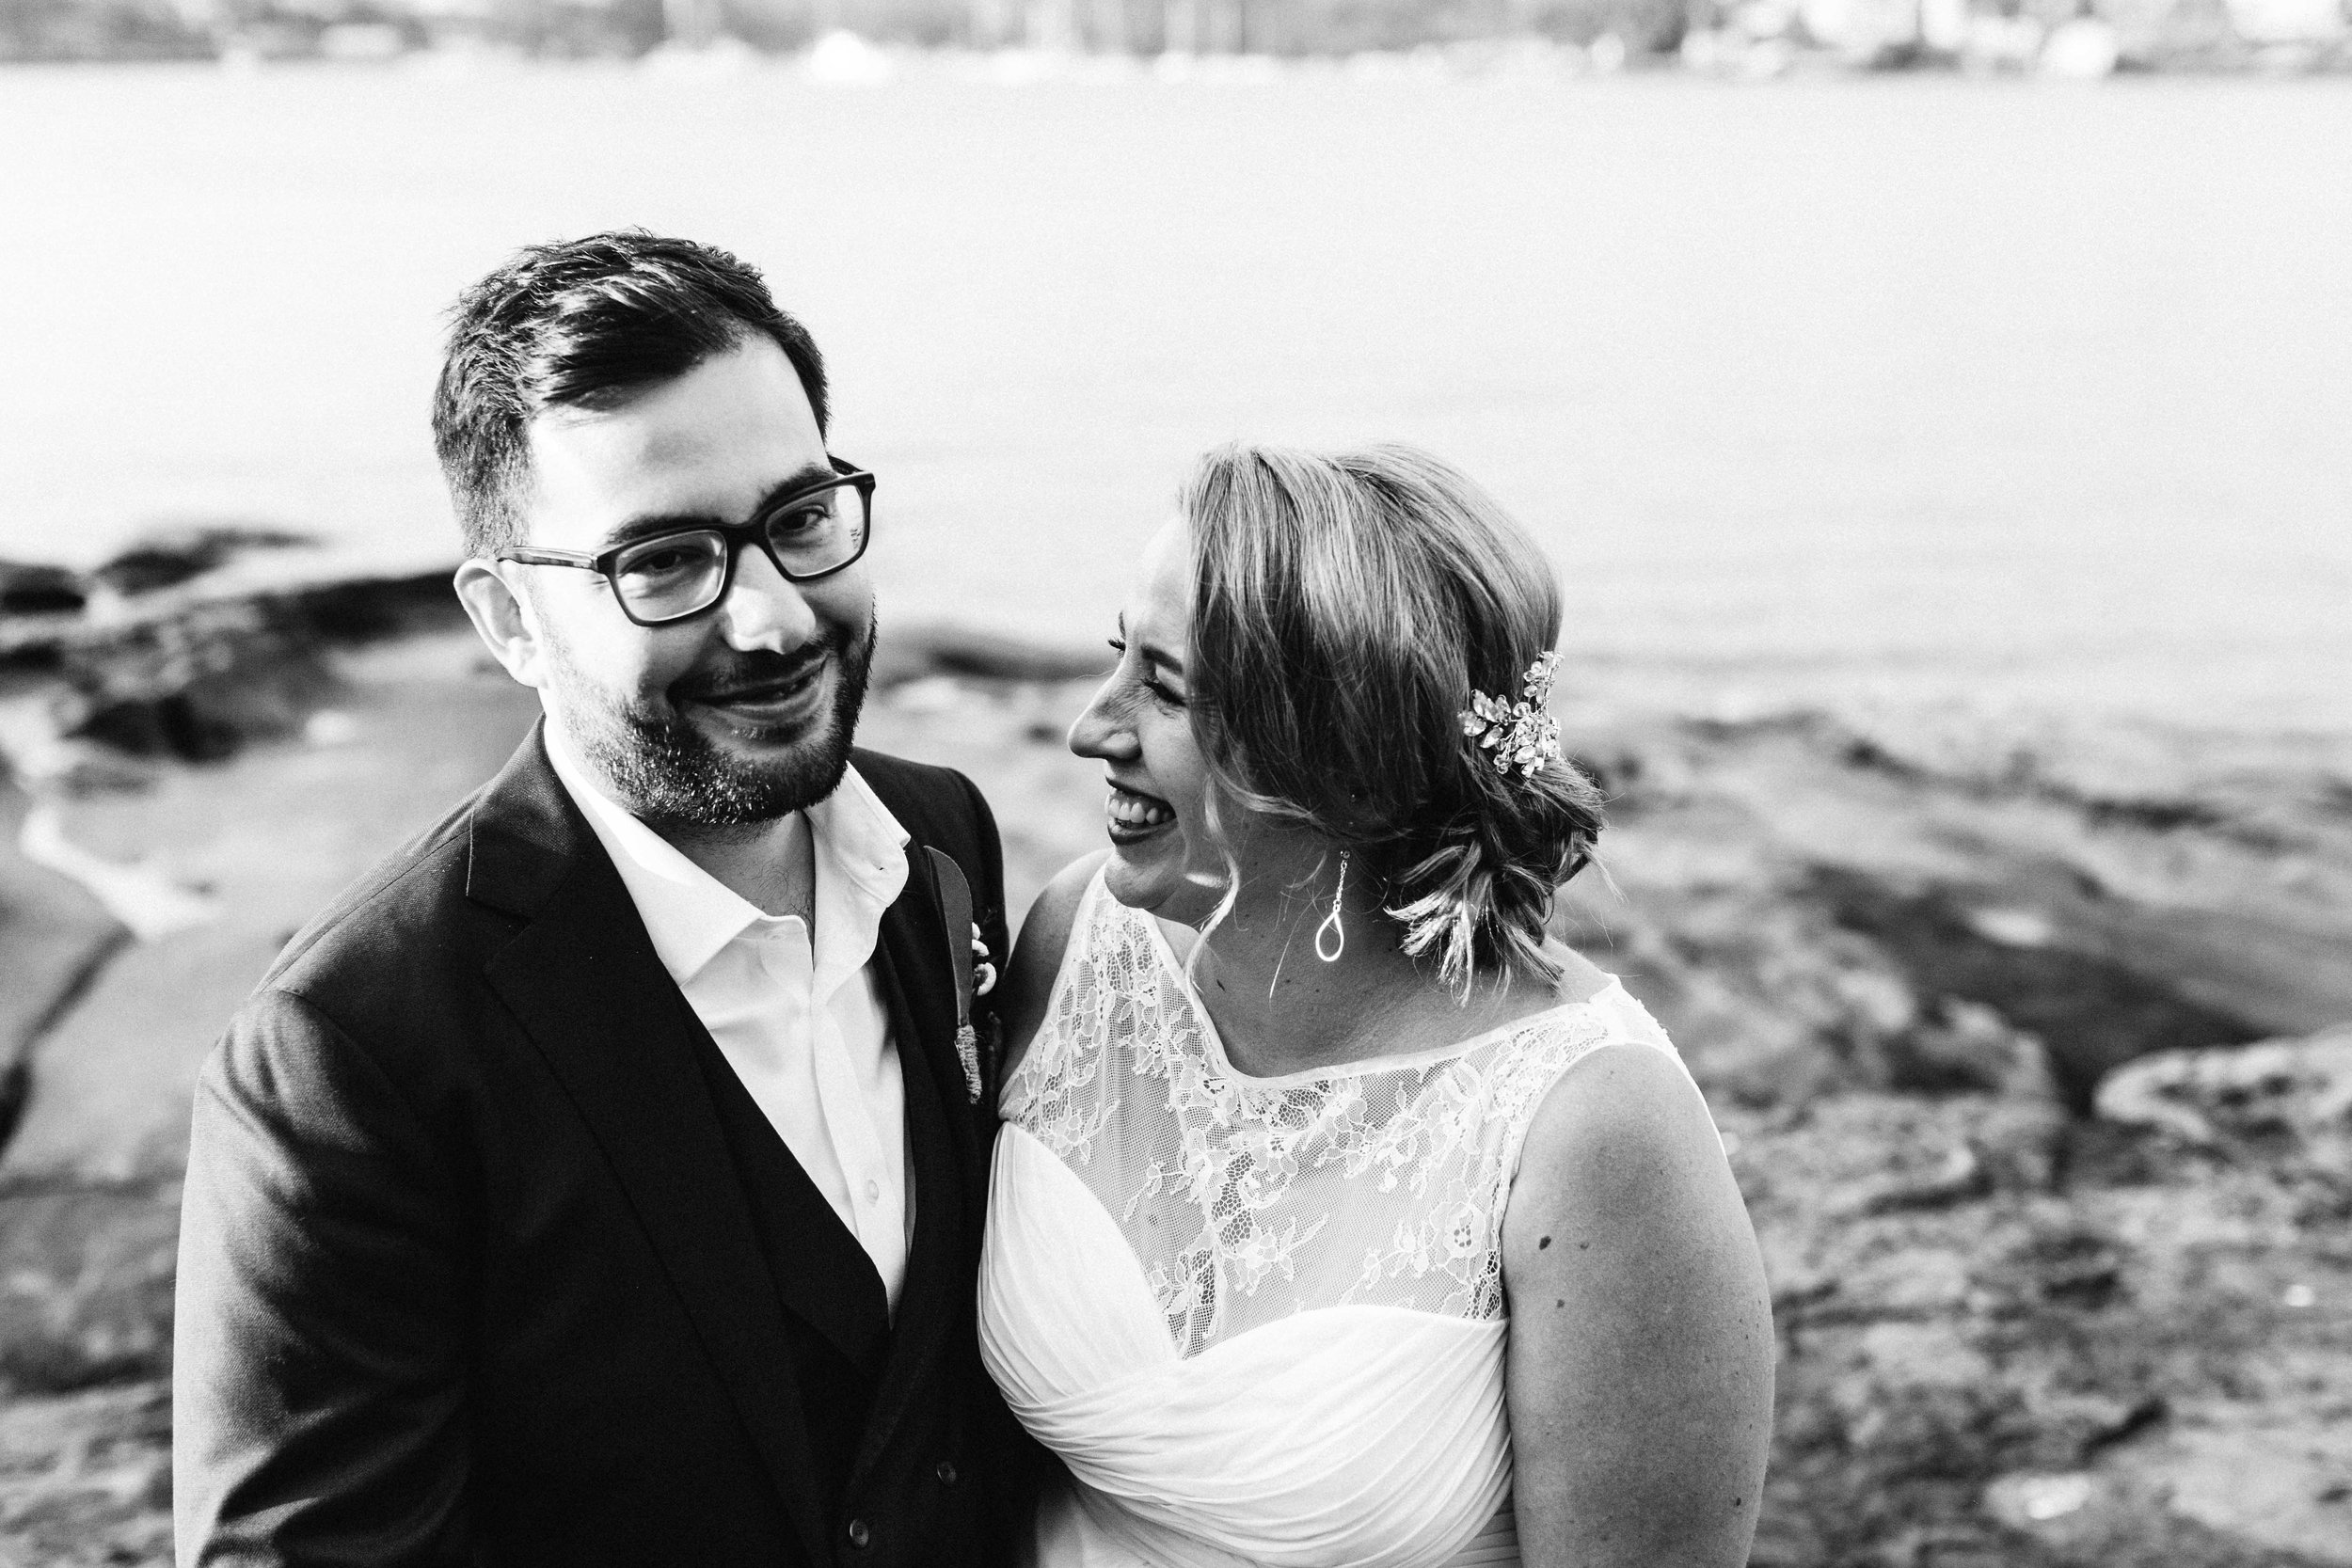 cabarita-park-sydney-wedding-emilyobrienphotography.net-52.jpg